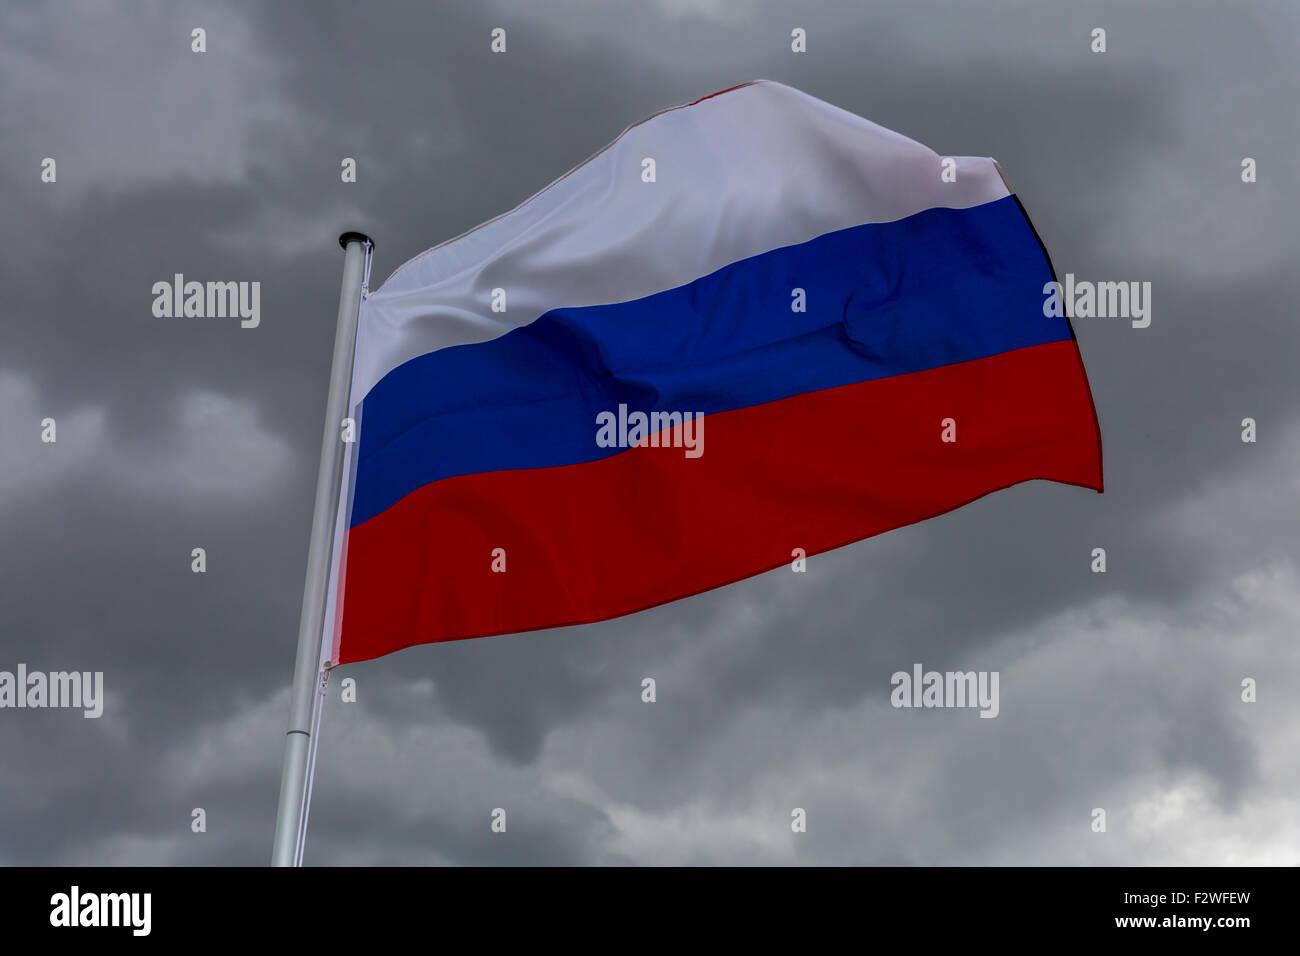 18.04.2015, Berlin, Berlin, Germany - Flag of Russian Federation waving in the wind. 0MK150416D032CAROEX.JPG - NOT - Stock Image